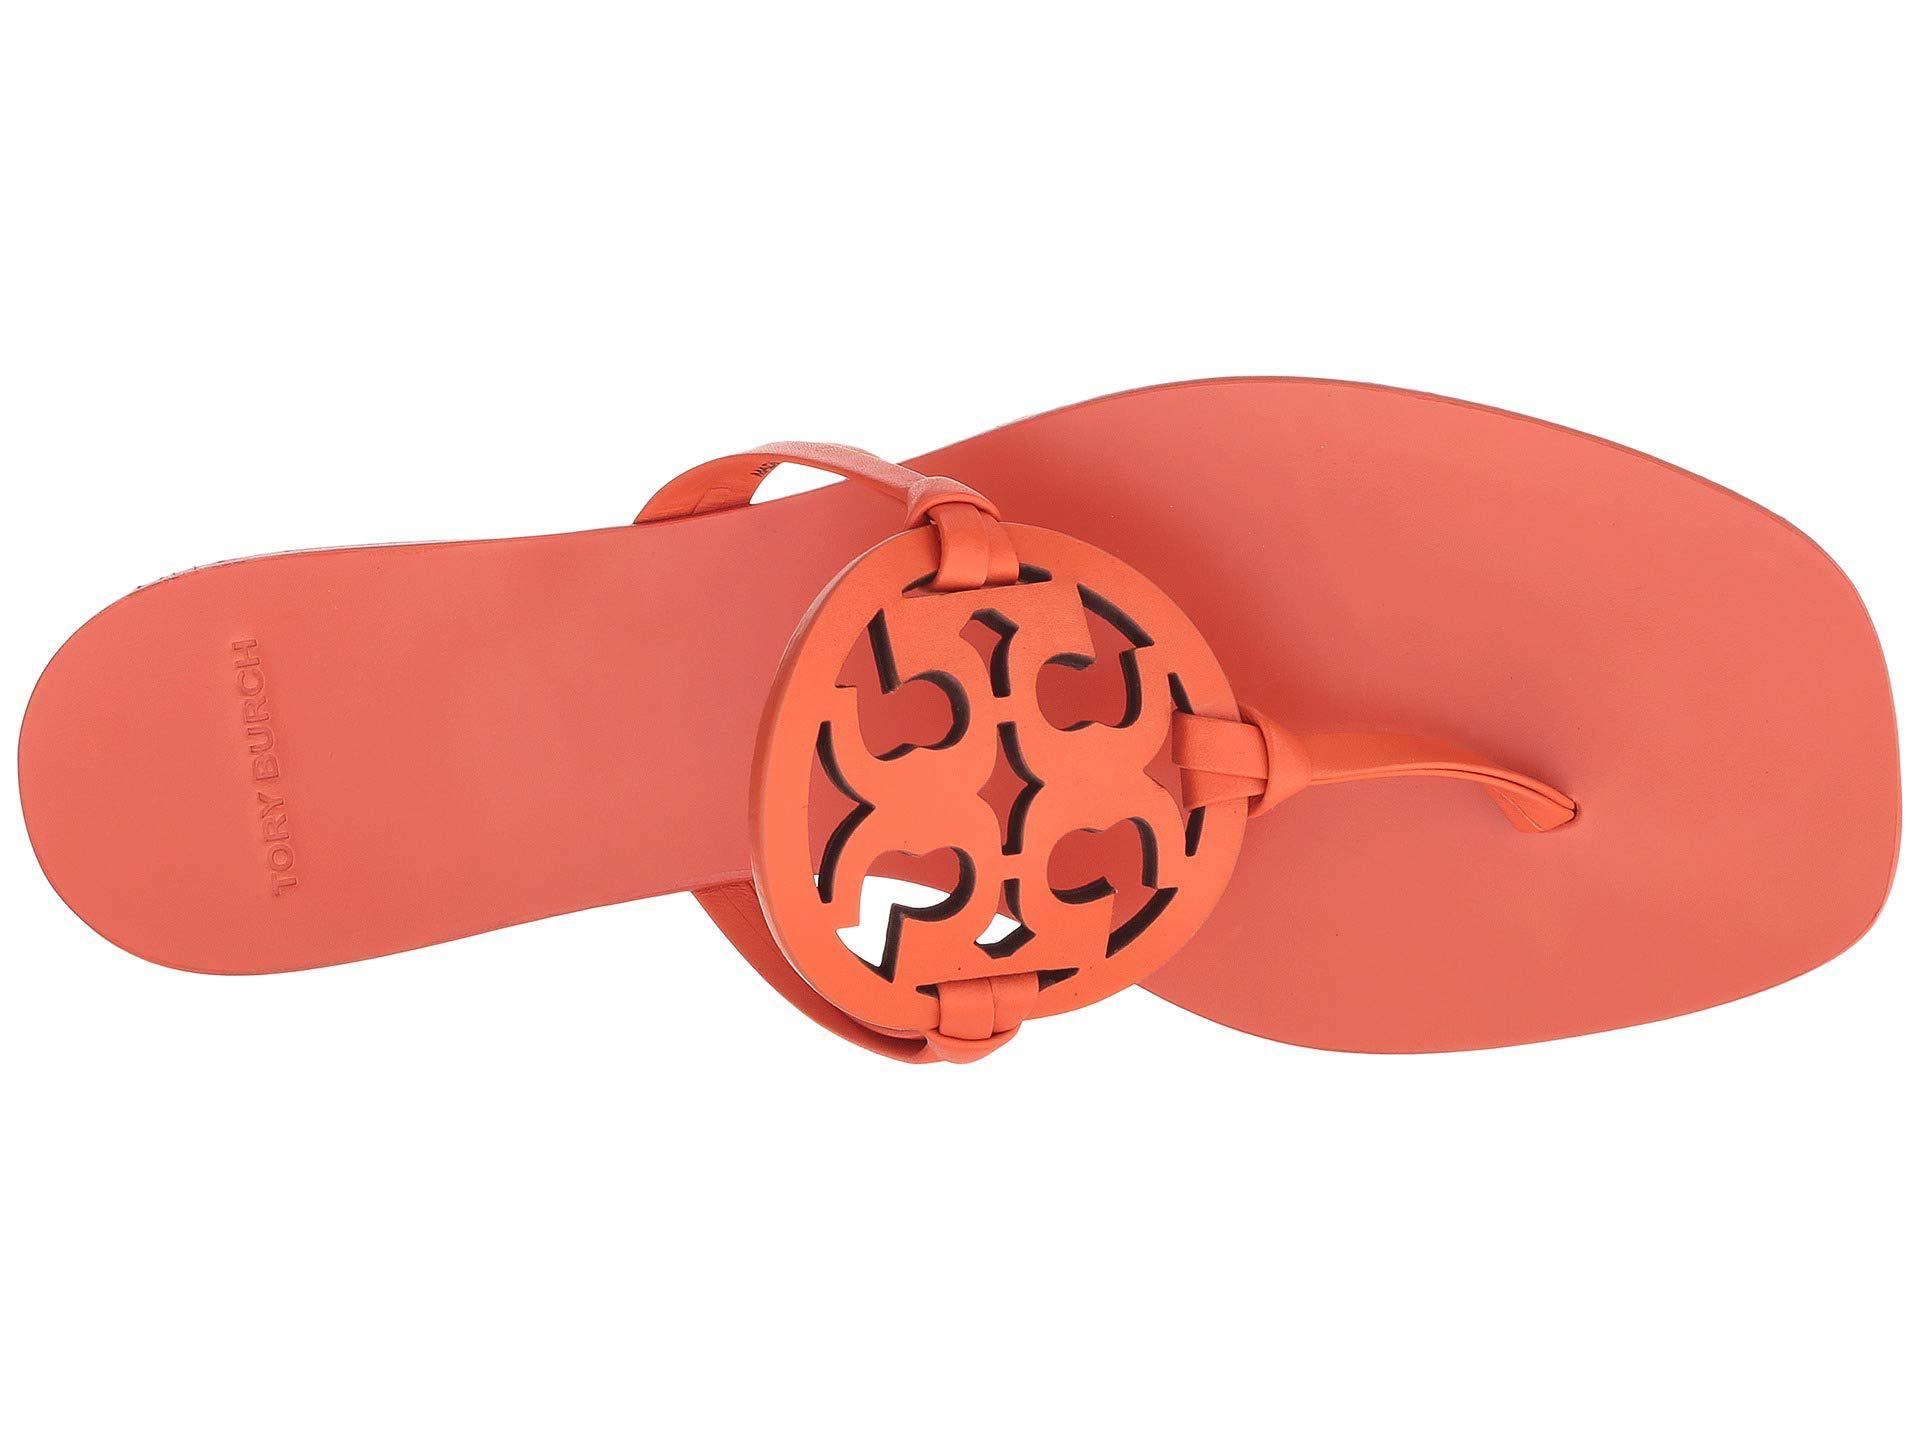 9b728ceedbe1 Tory Burch - Multicolor Miller Square Toe (sweet Tangerine) Women s Shoes -  Lyst. View fullscreen